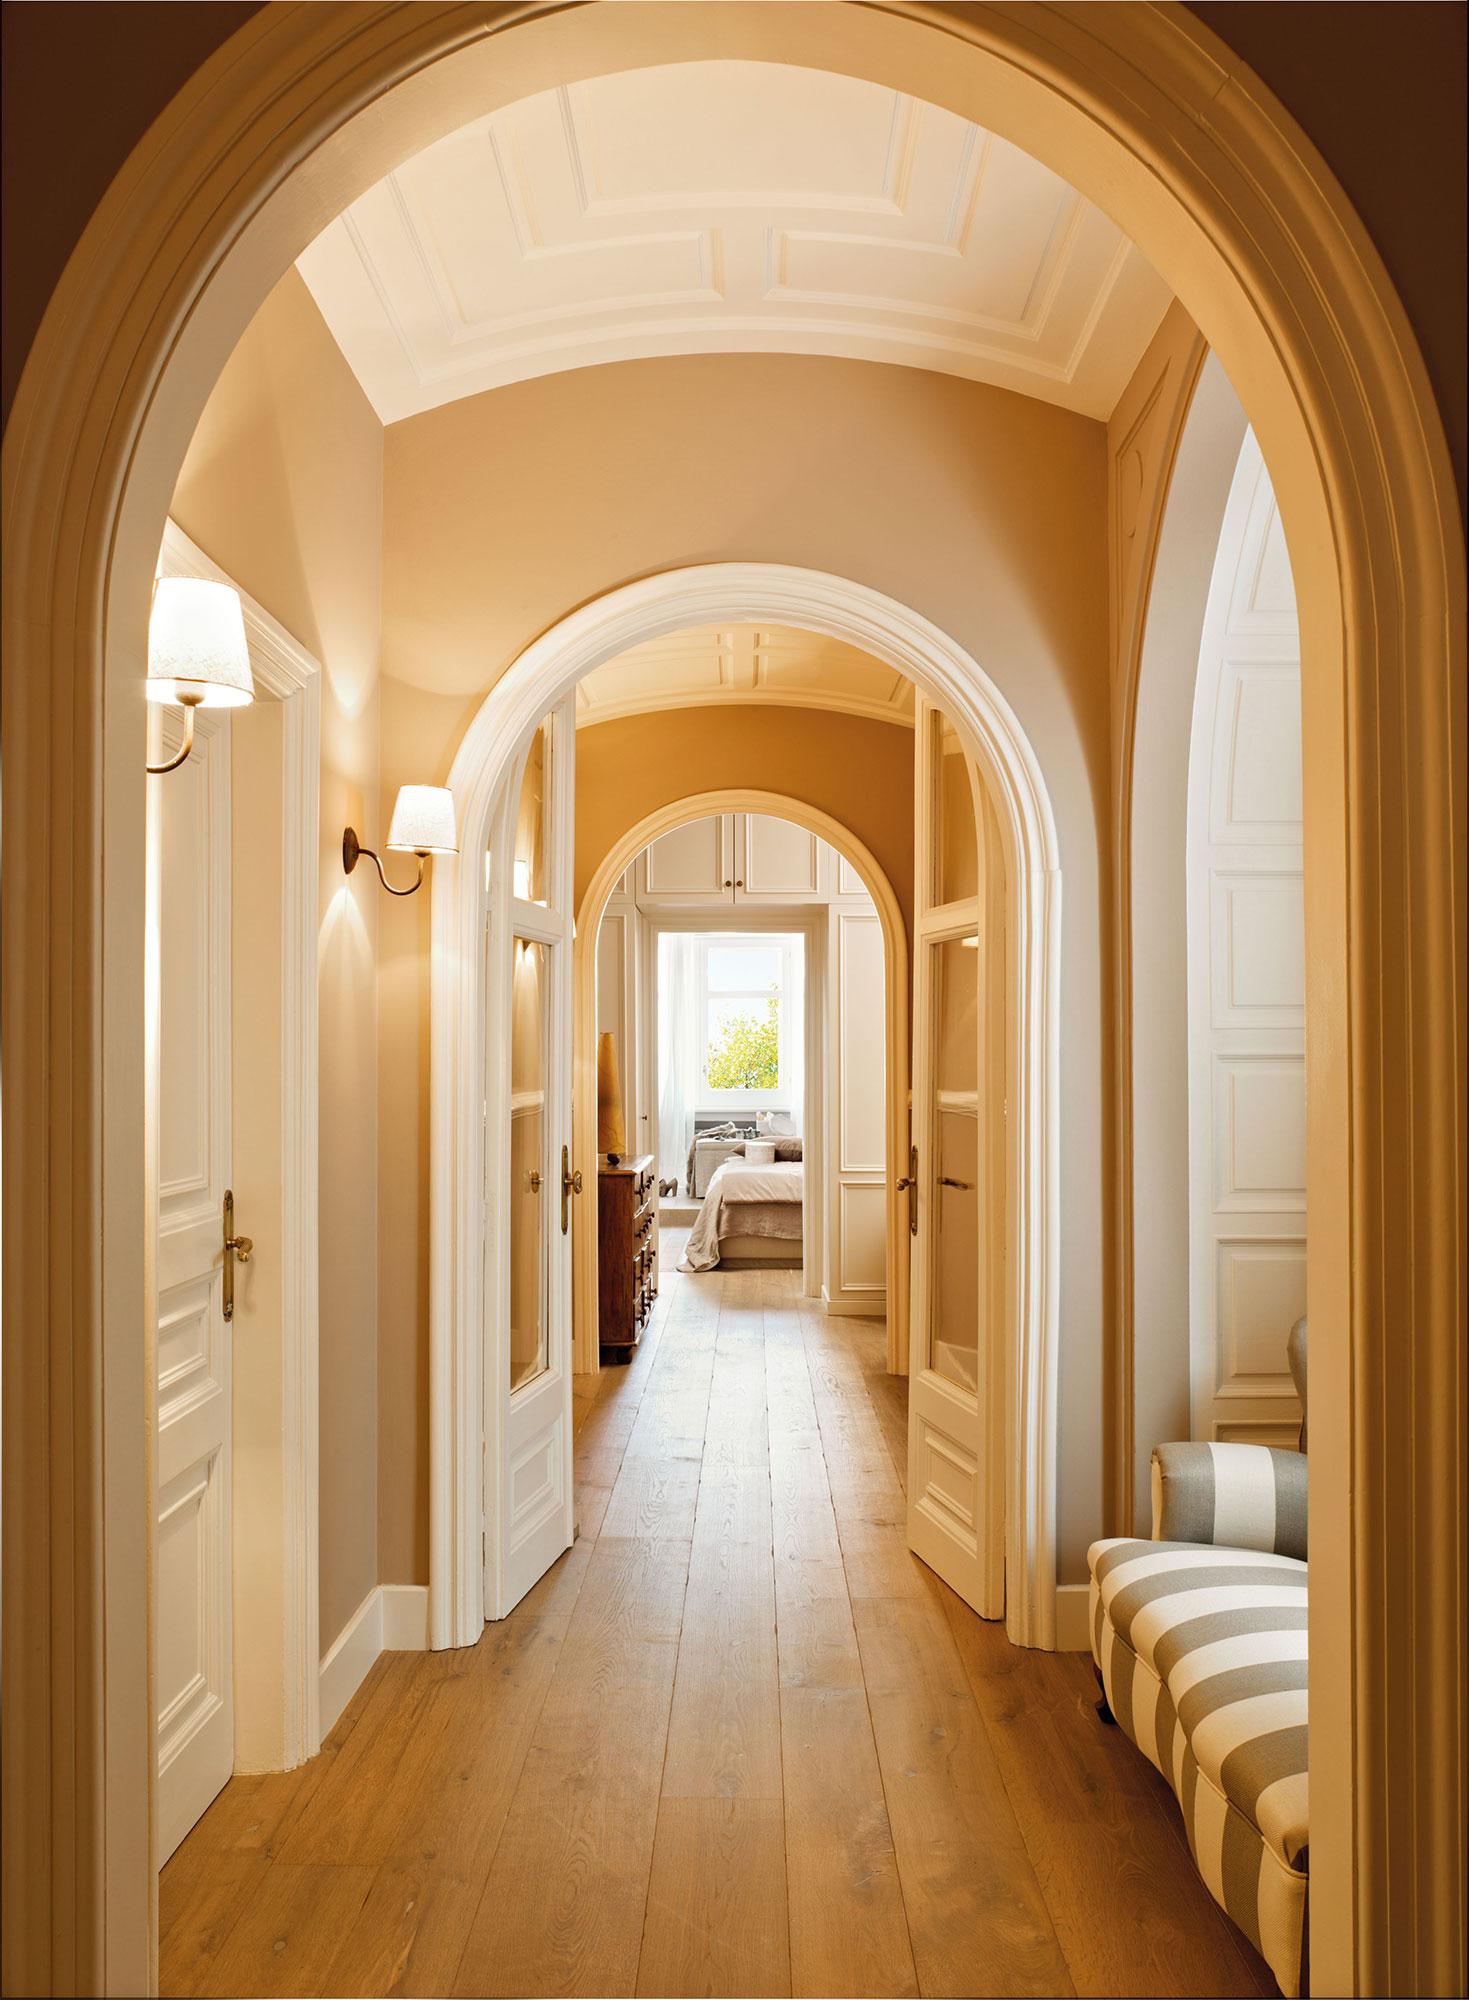 C mo renovar las puertas de casa - Decorar pasillo con fotos ...